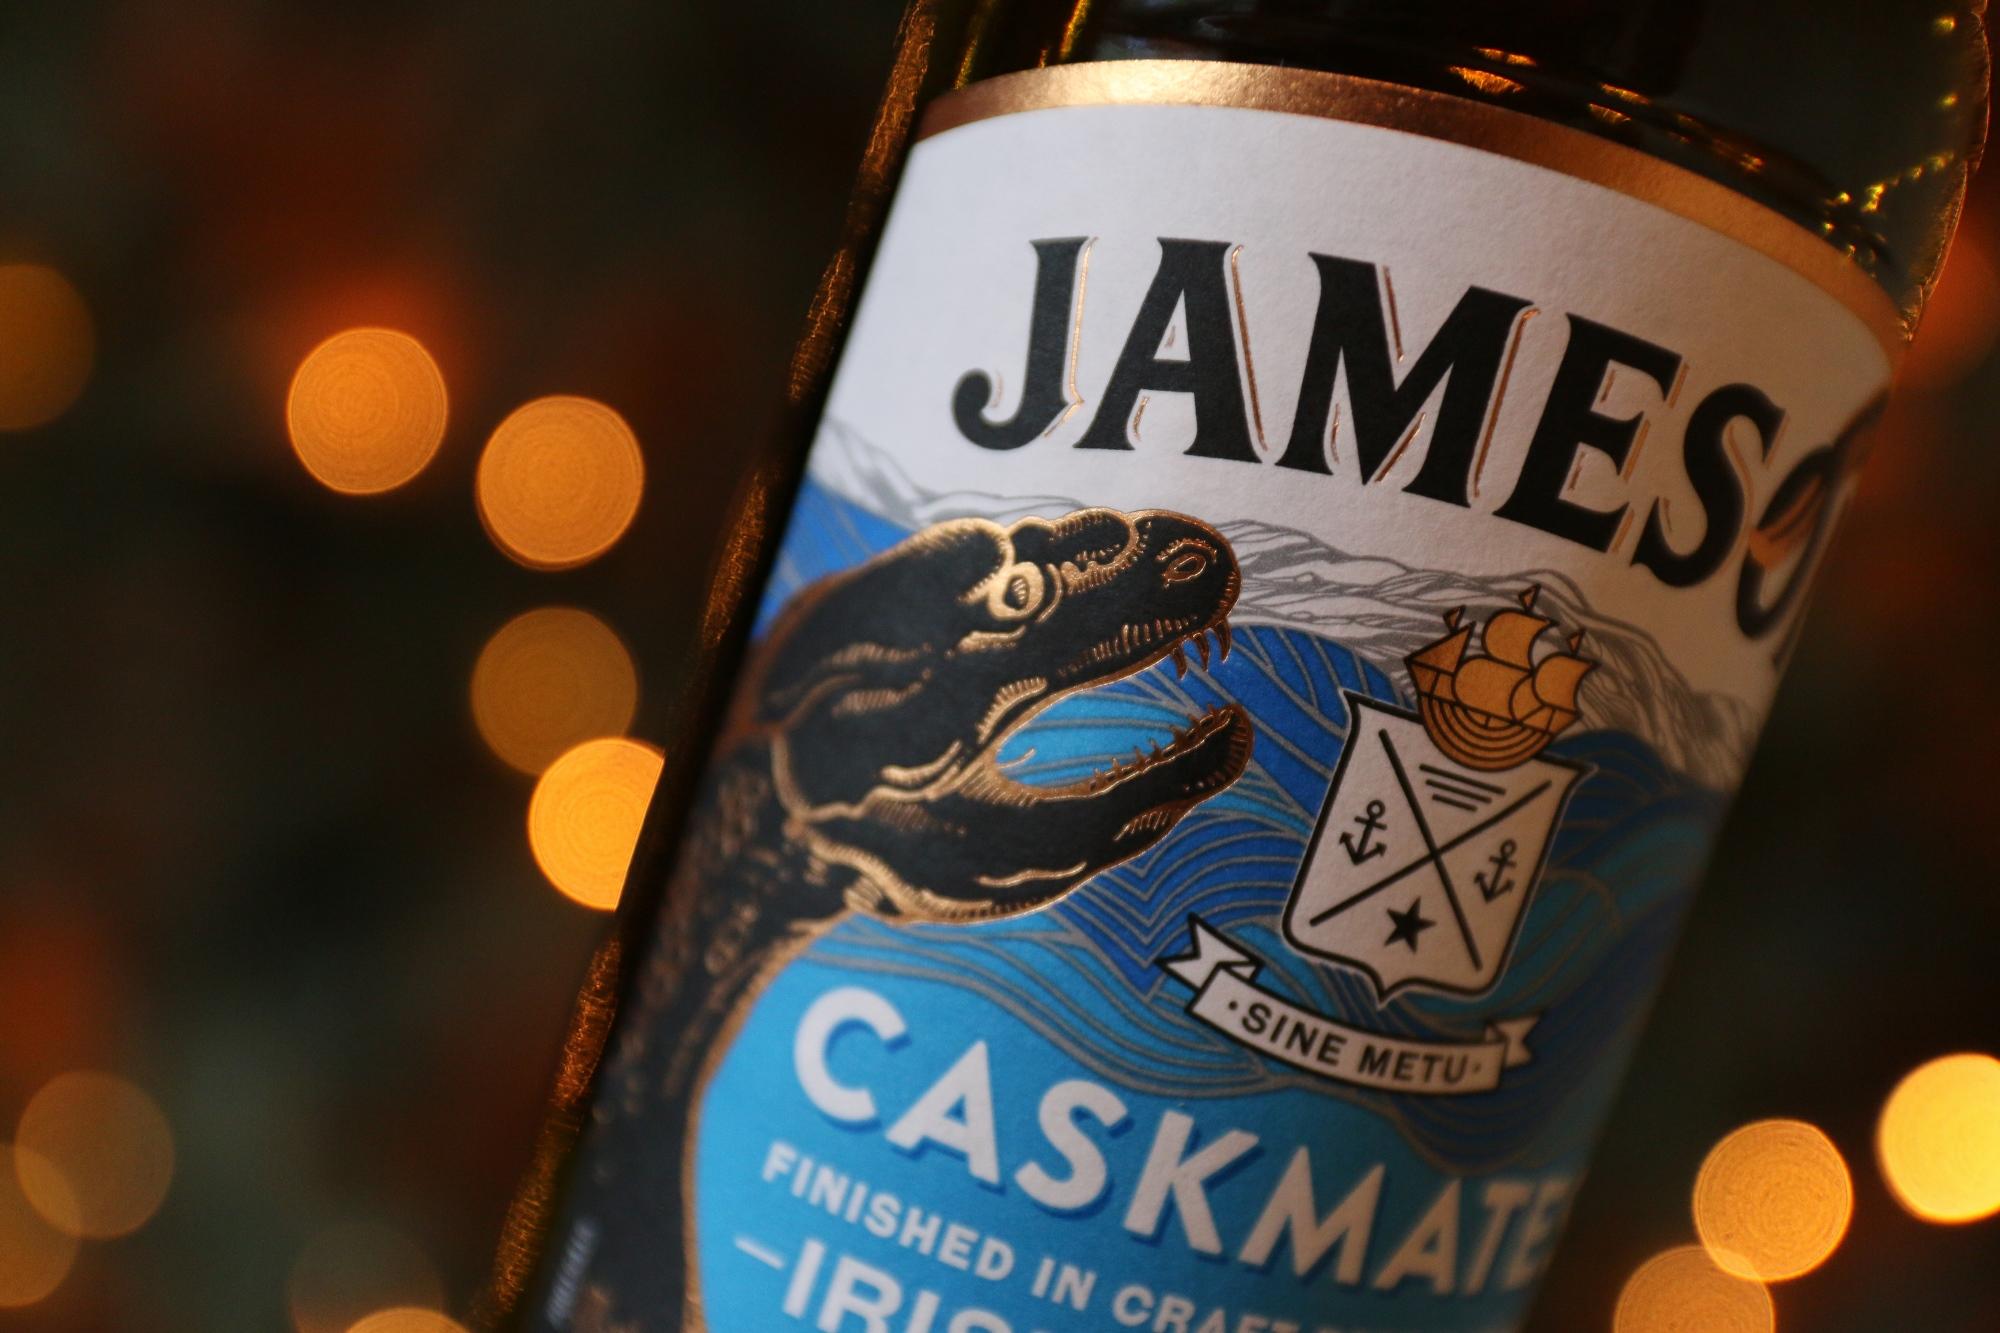 jameson-caskmates-fourpure-edition